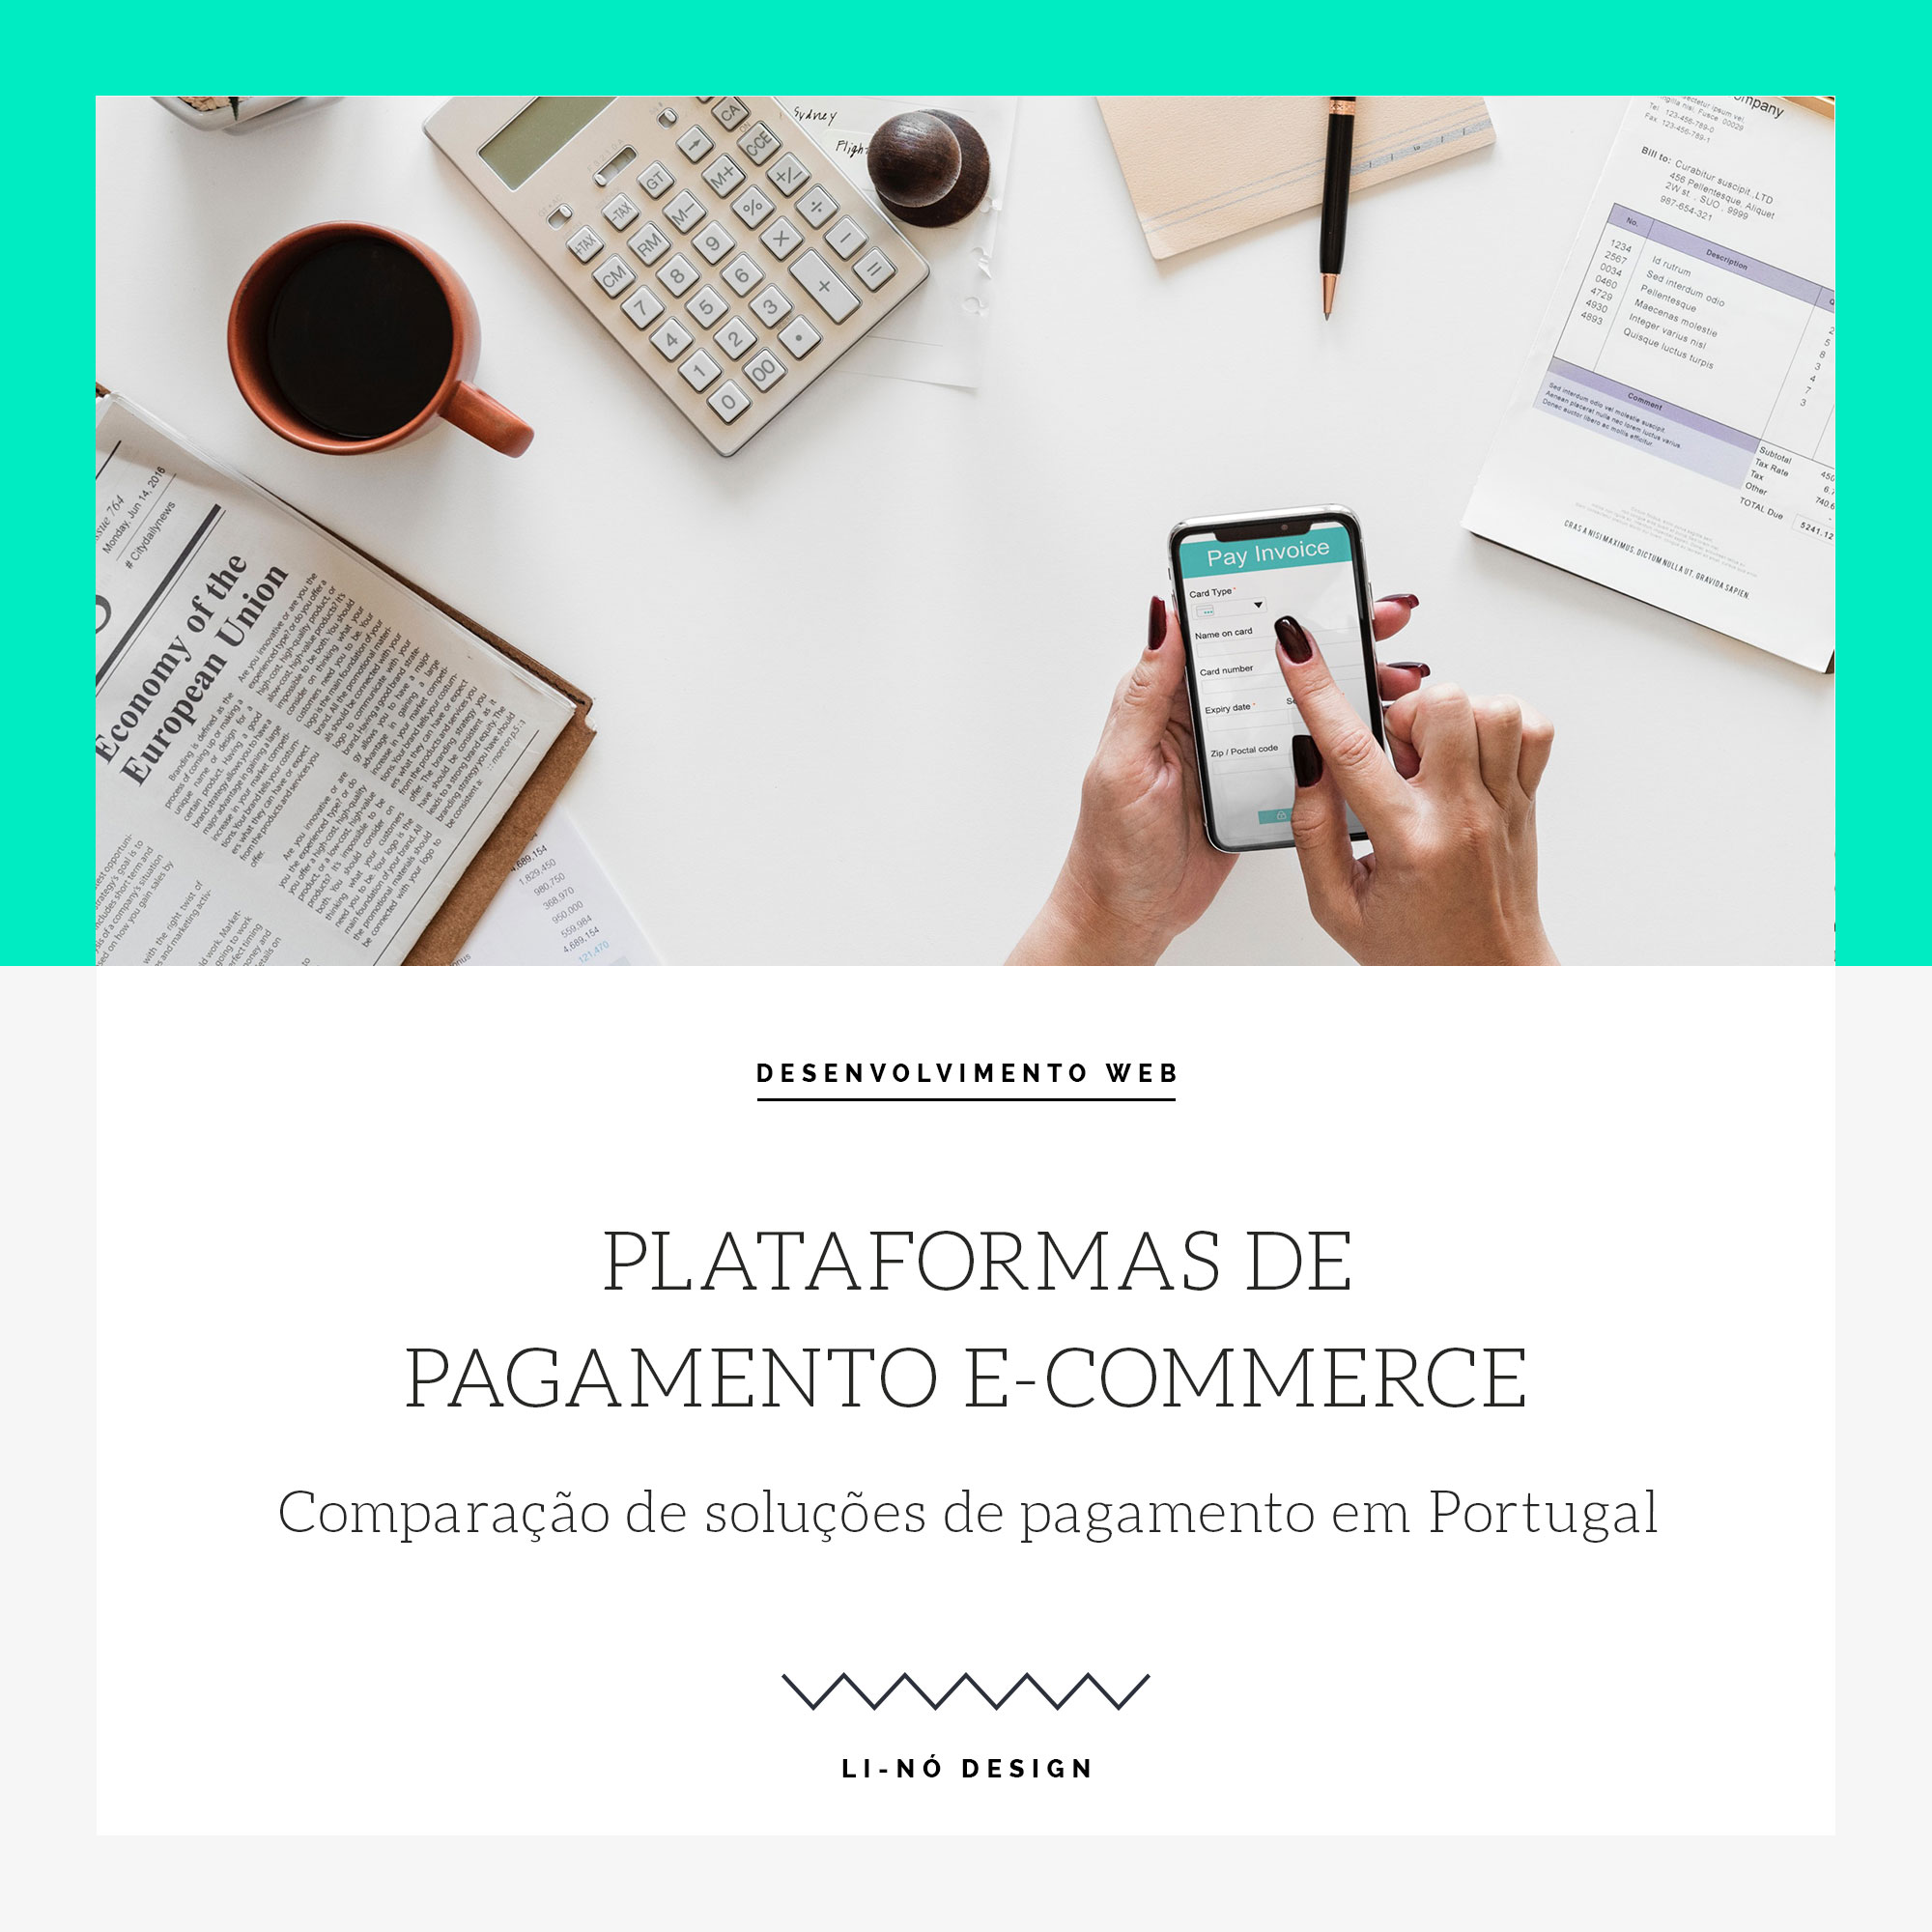 plataformas de pagamento e-commerce